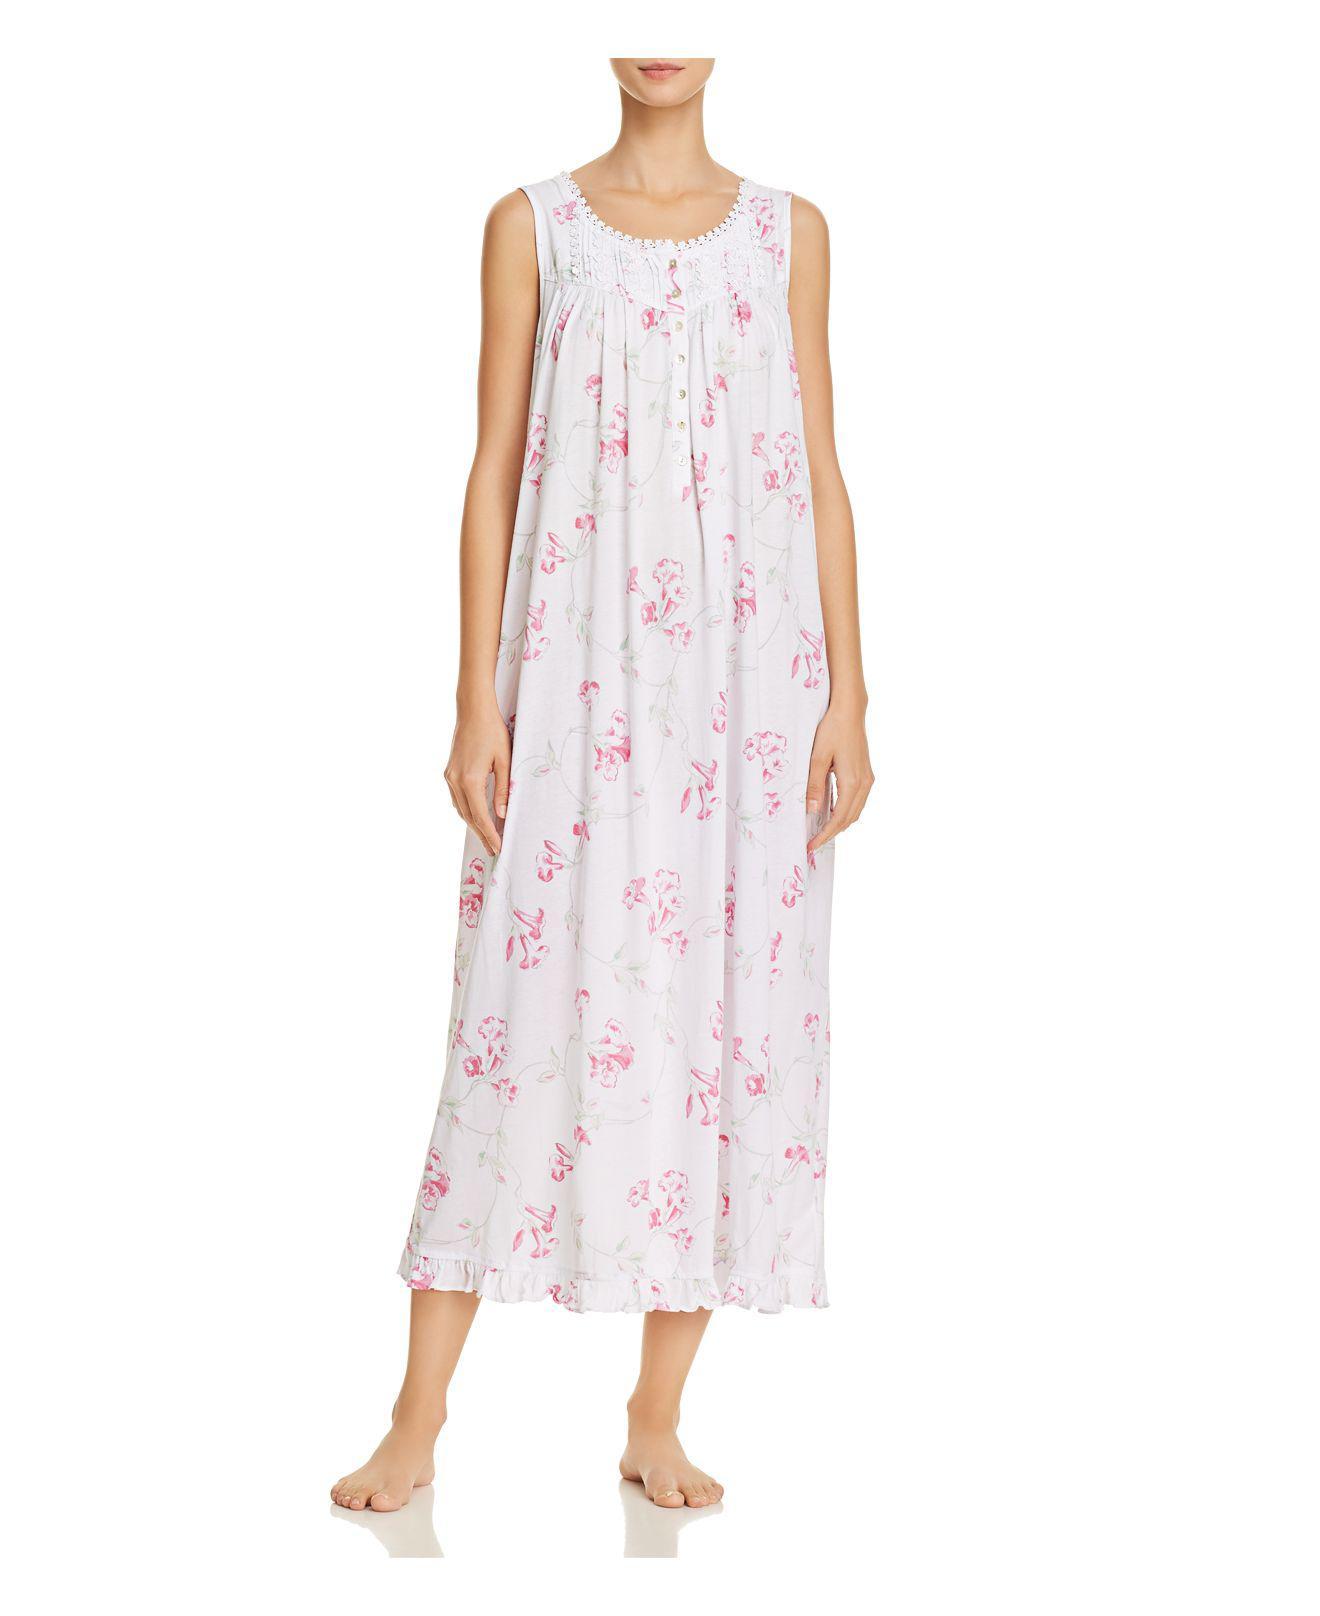 32fbadaab3 Lyst - Eileen West Sleeveless Knit Ballet Nightgown in Pink